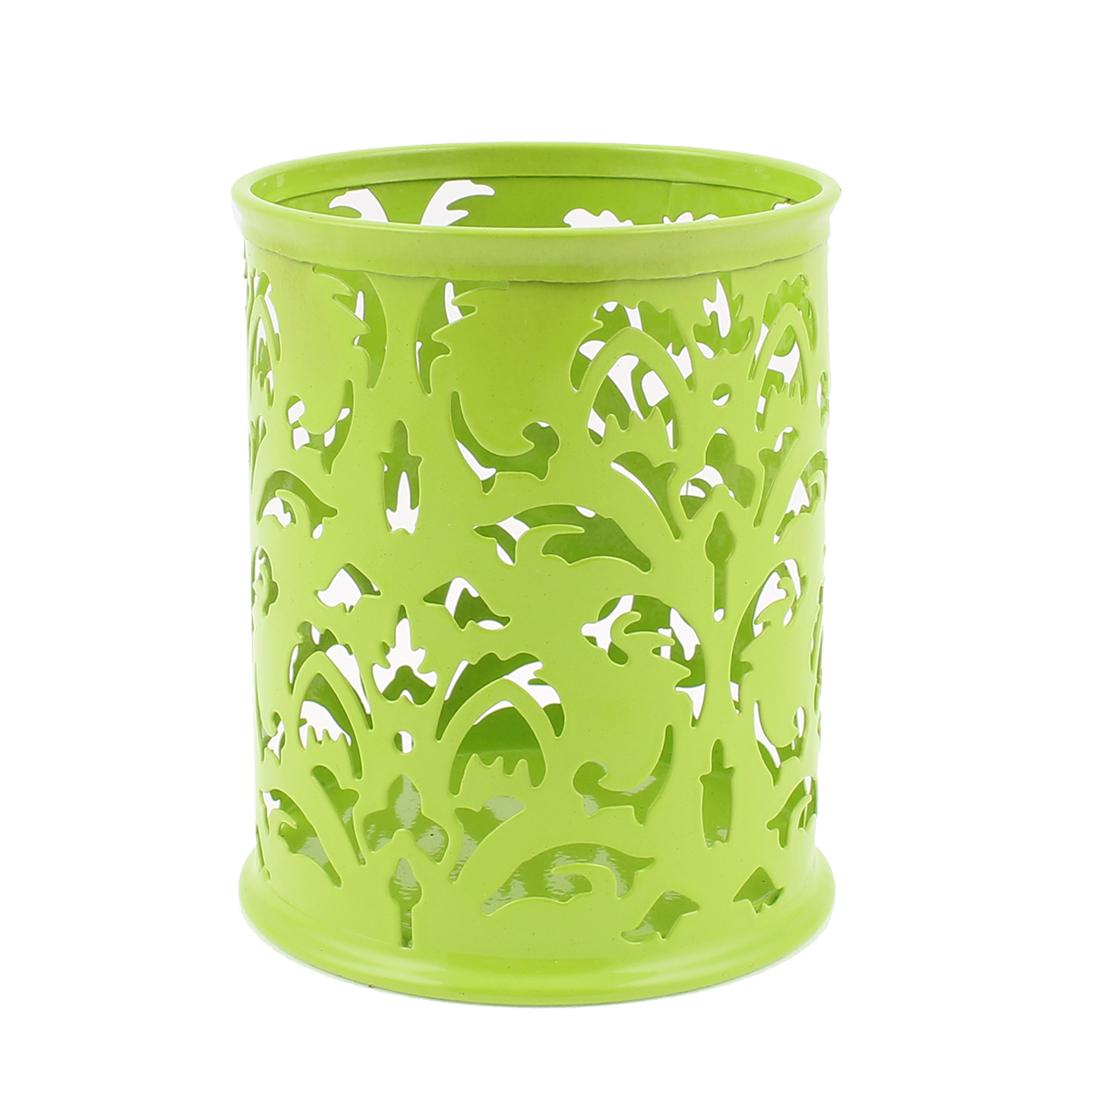 Hollow Flower Design Cylinder Pen Pencil Pot Holder Container Organizer Green